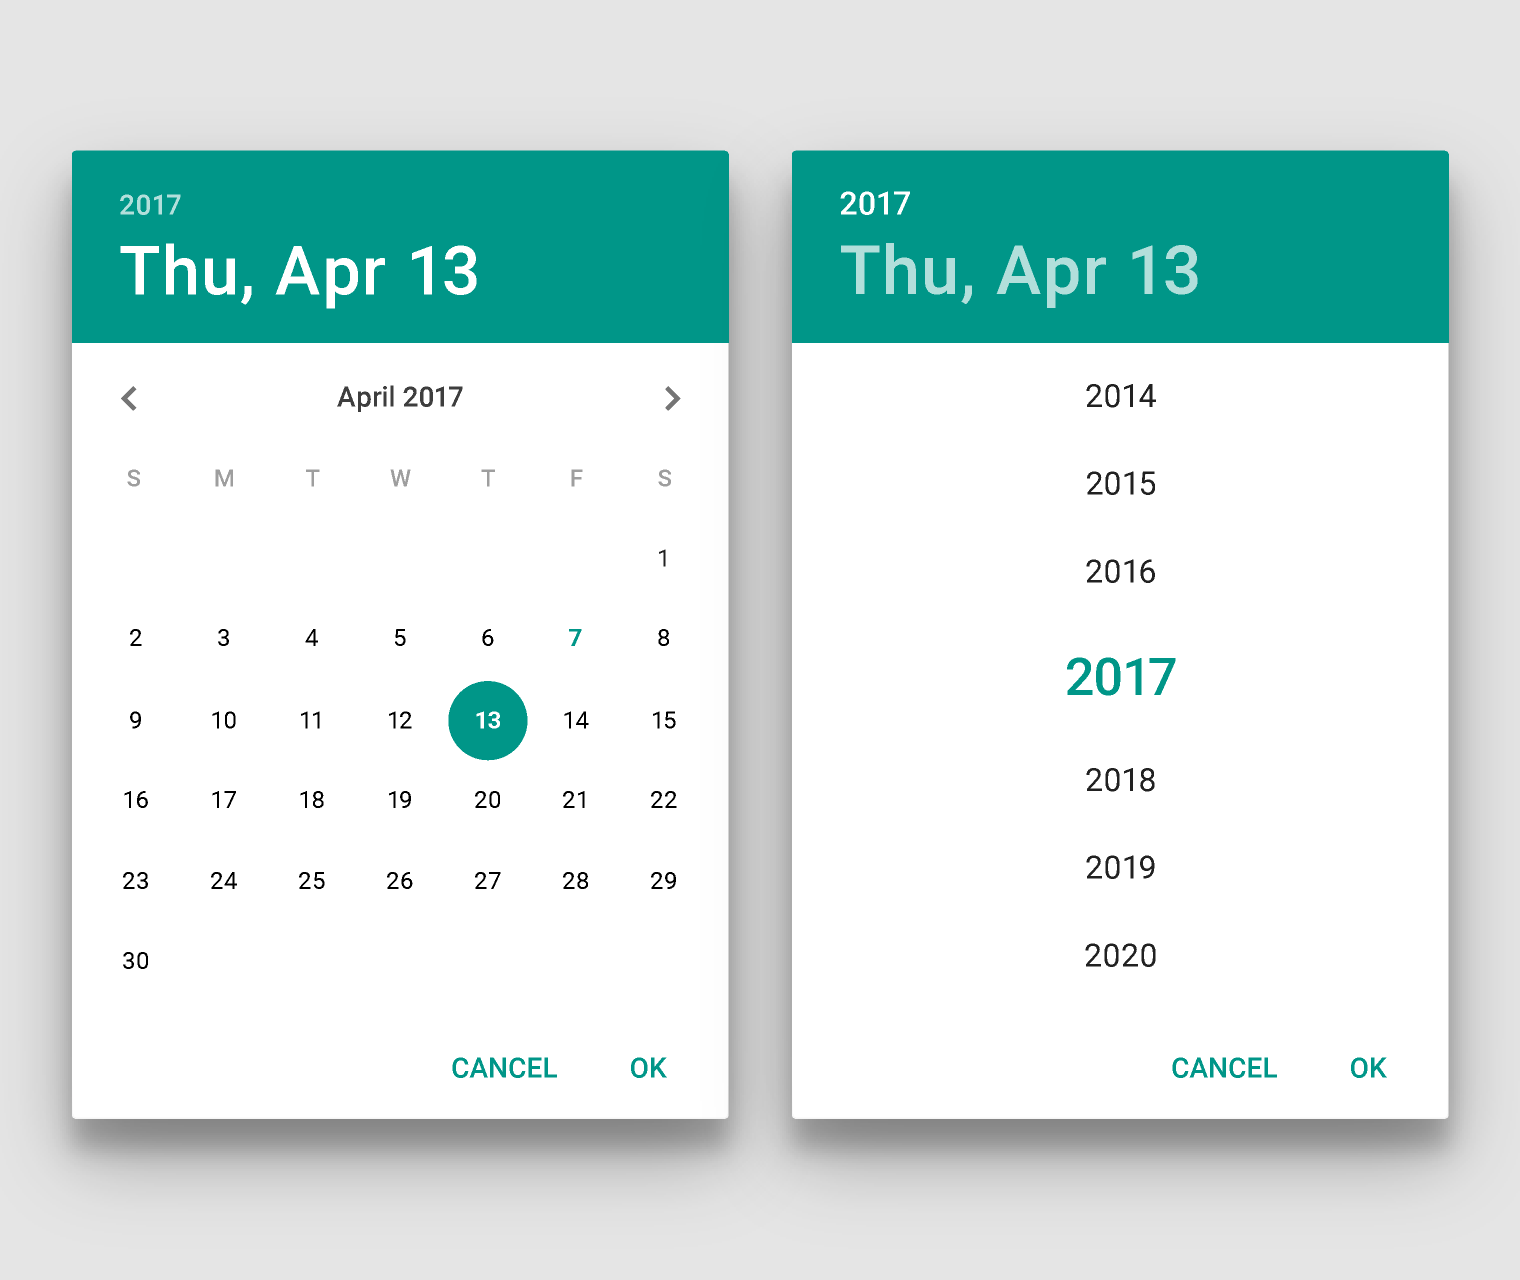 Calendar Material Design Javascript : Pickers components material design